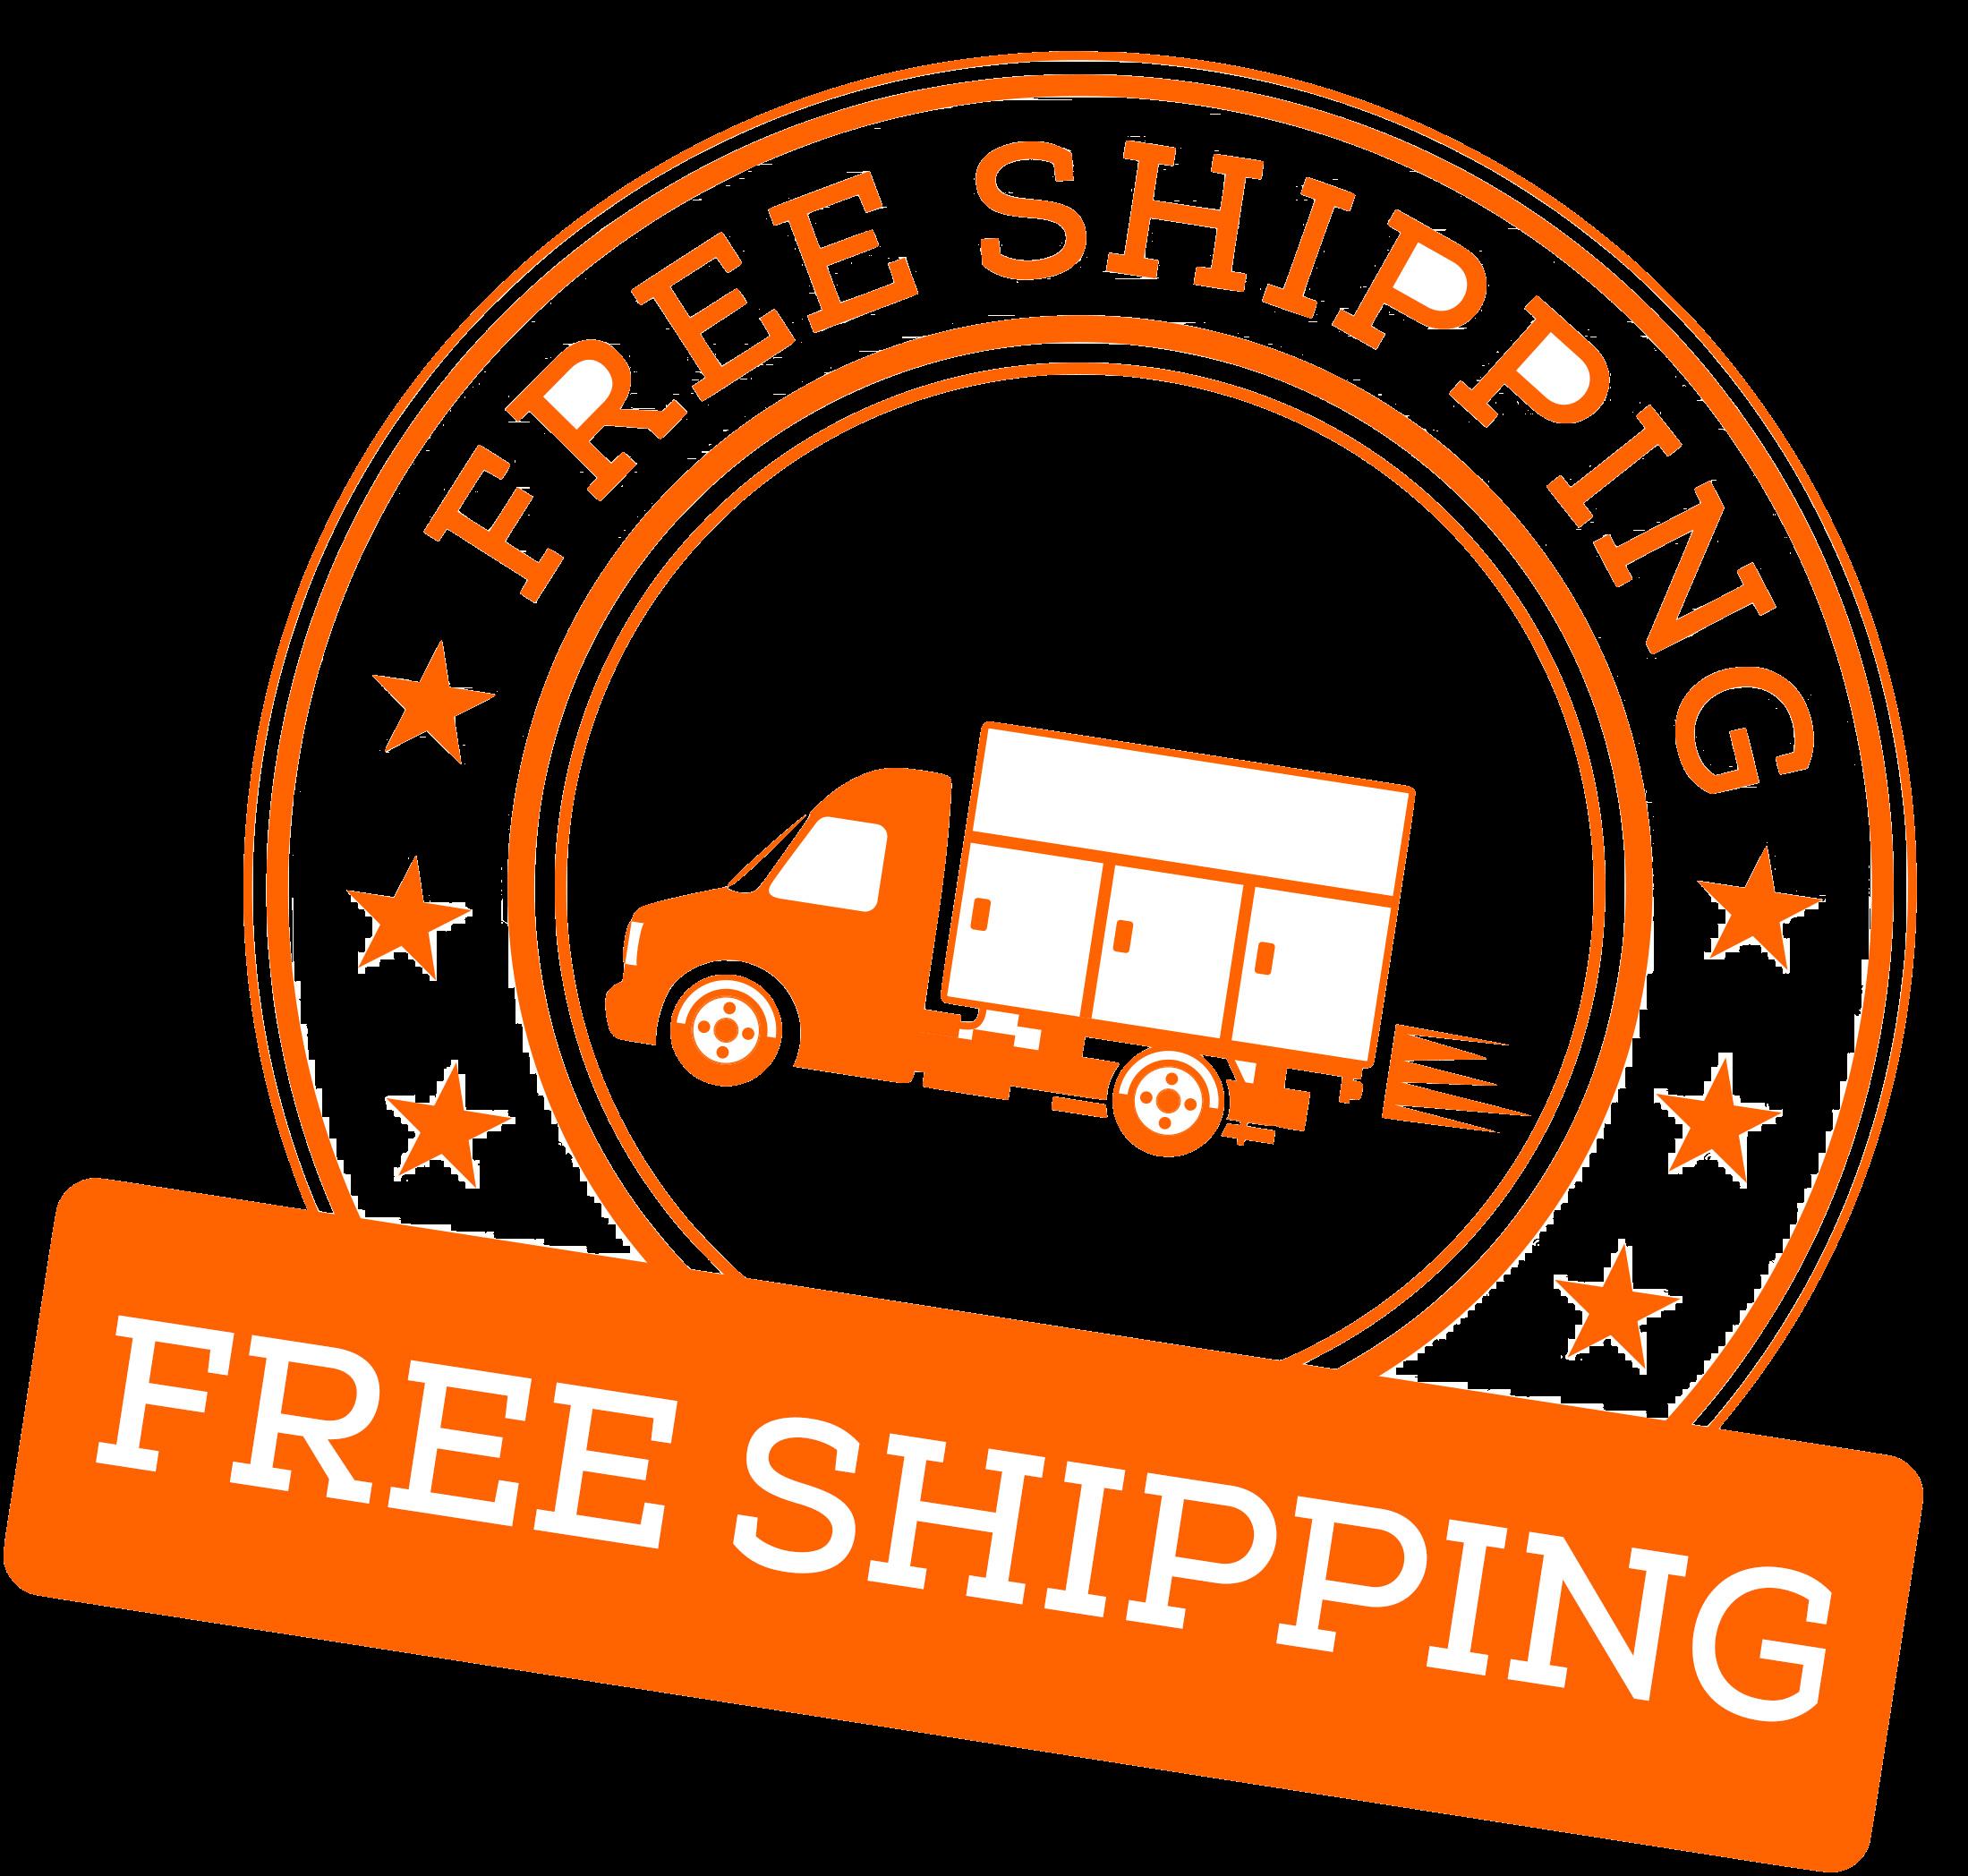 free shipping_2_JPG